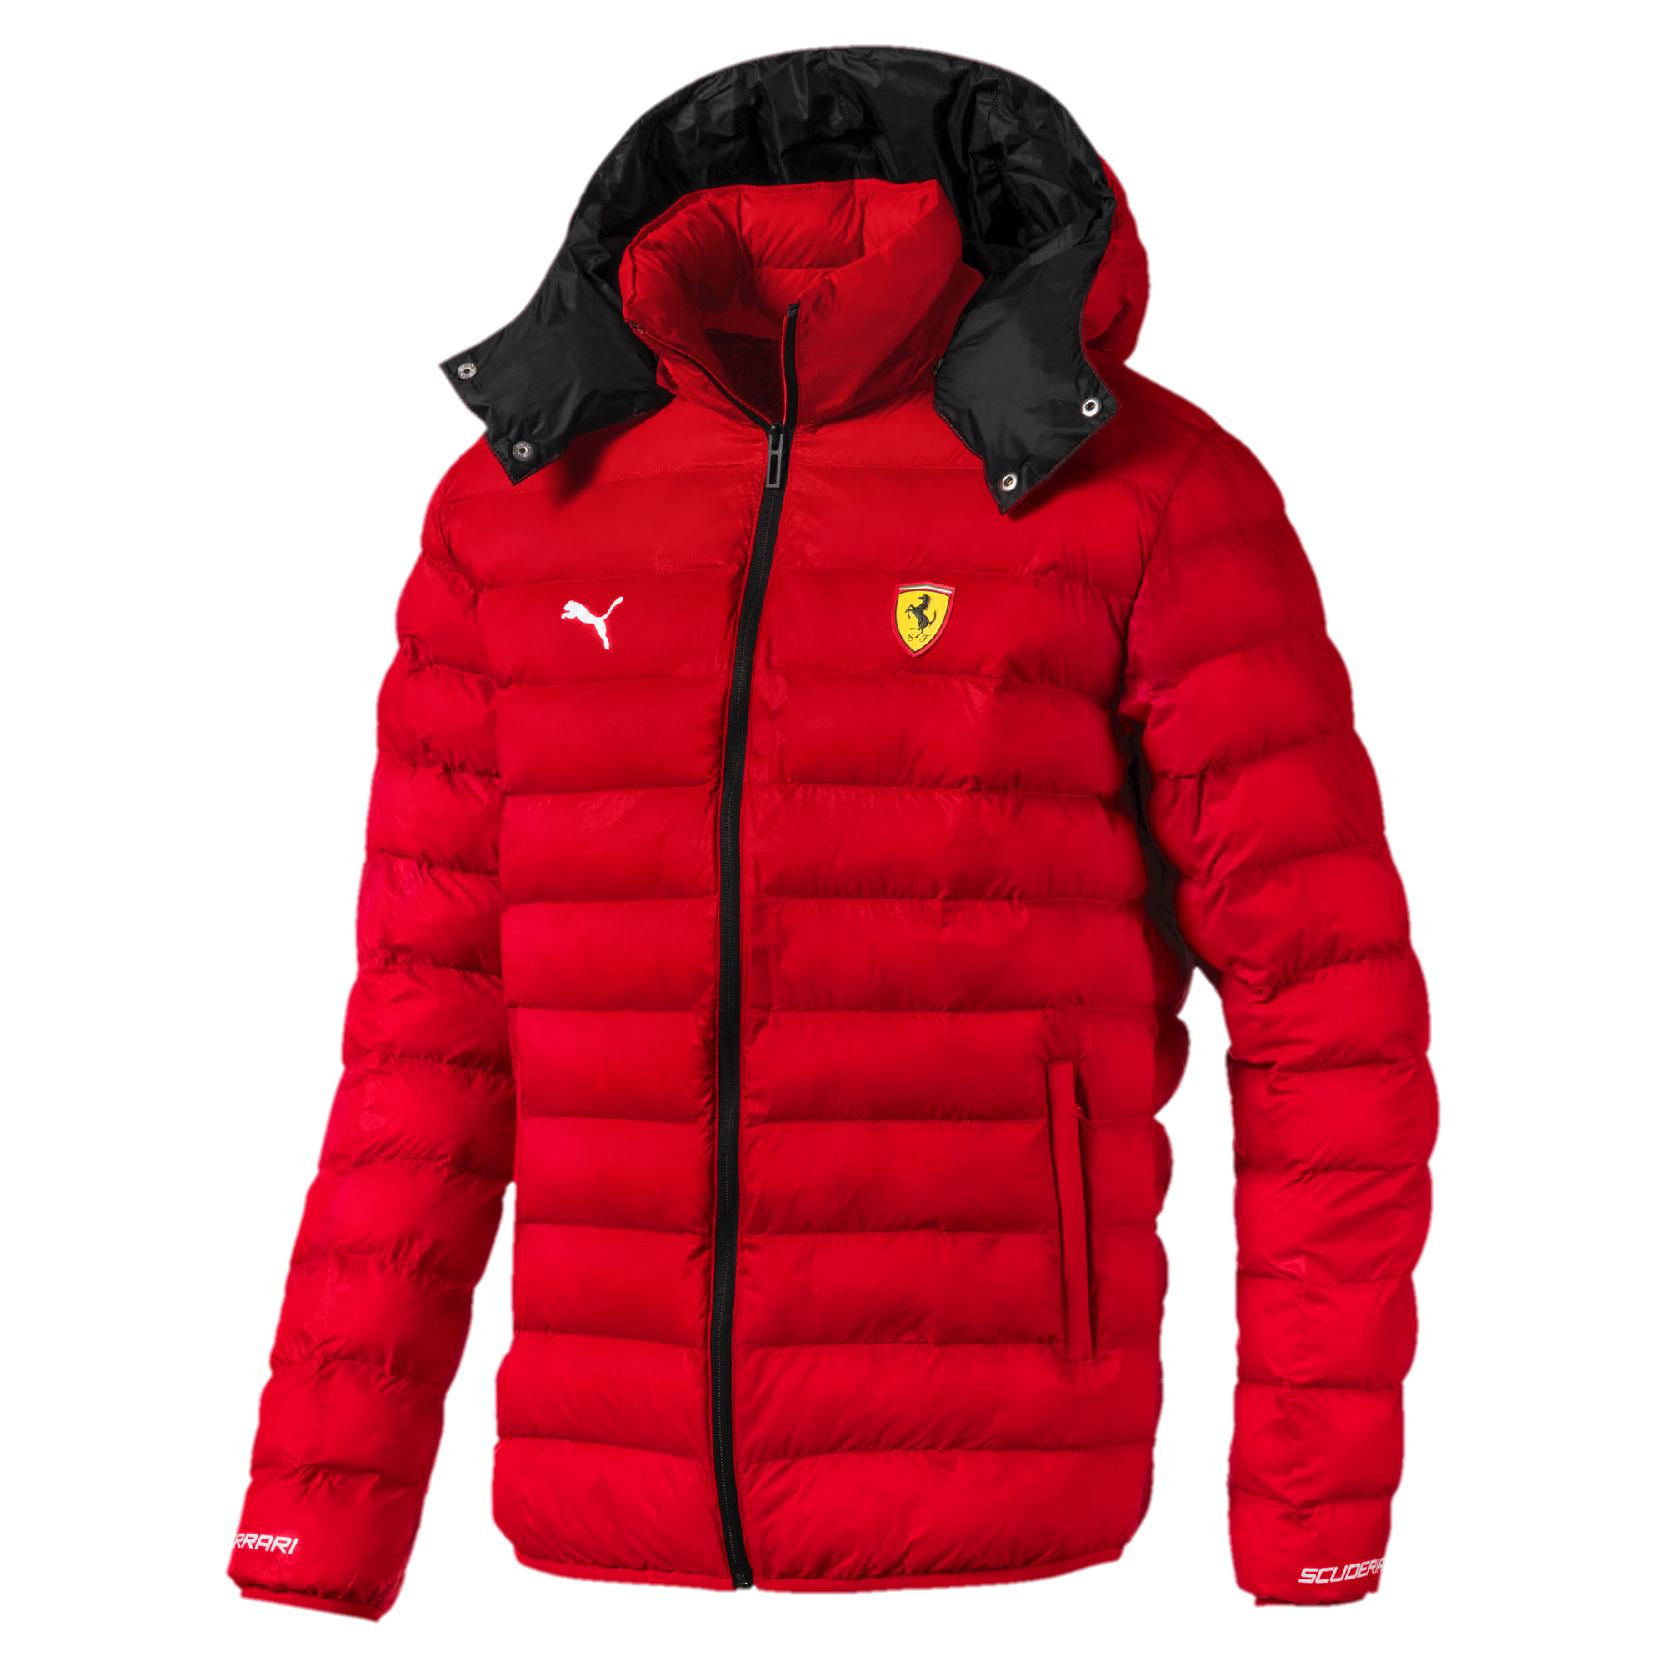 Scuderia Ferrari Puma Mens Jacket Packlite Zip Up Hooded Coat RED Sizes  XS,XXL